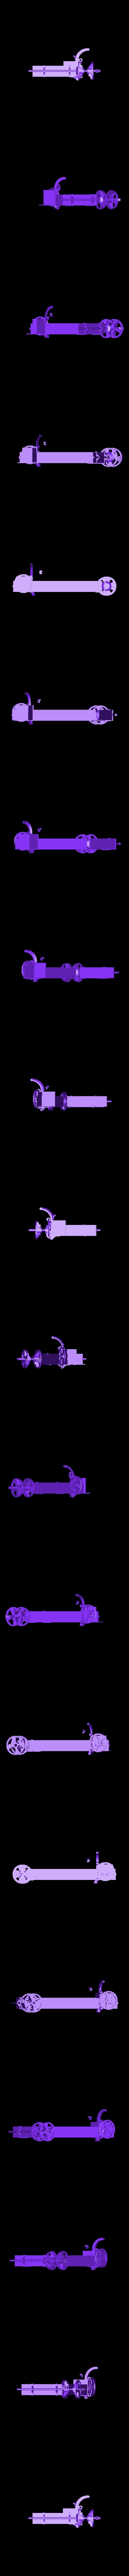 Anycubic_I3_Mega_Filamentrollenhalter.stl Download free STL file Anycubic I3 Mega Spool Holder • 3D print object, dede67